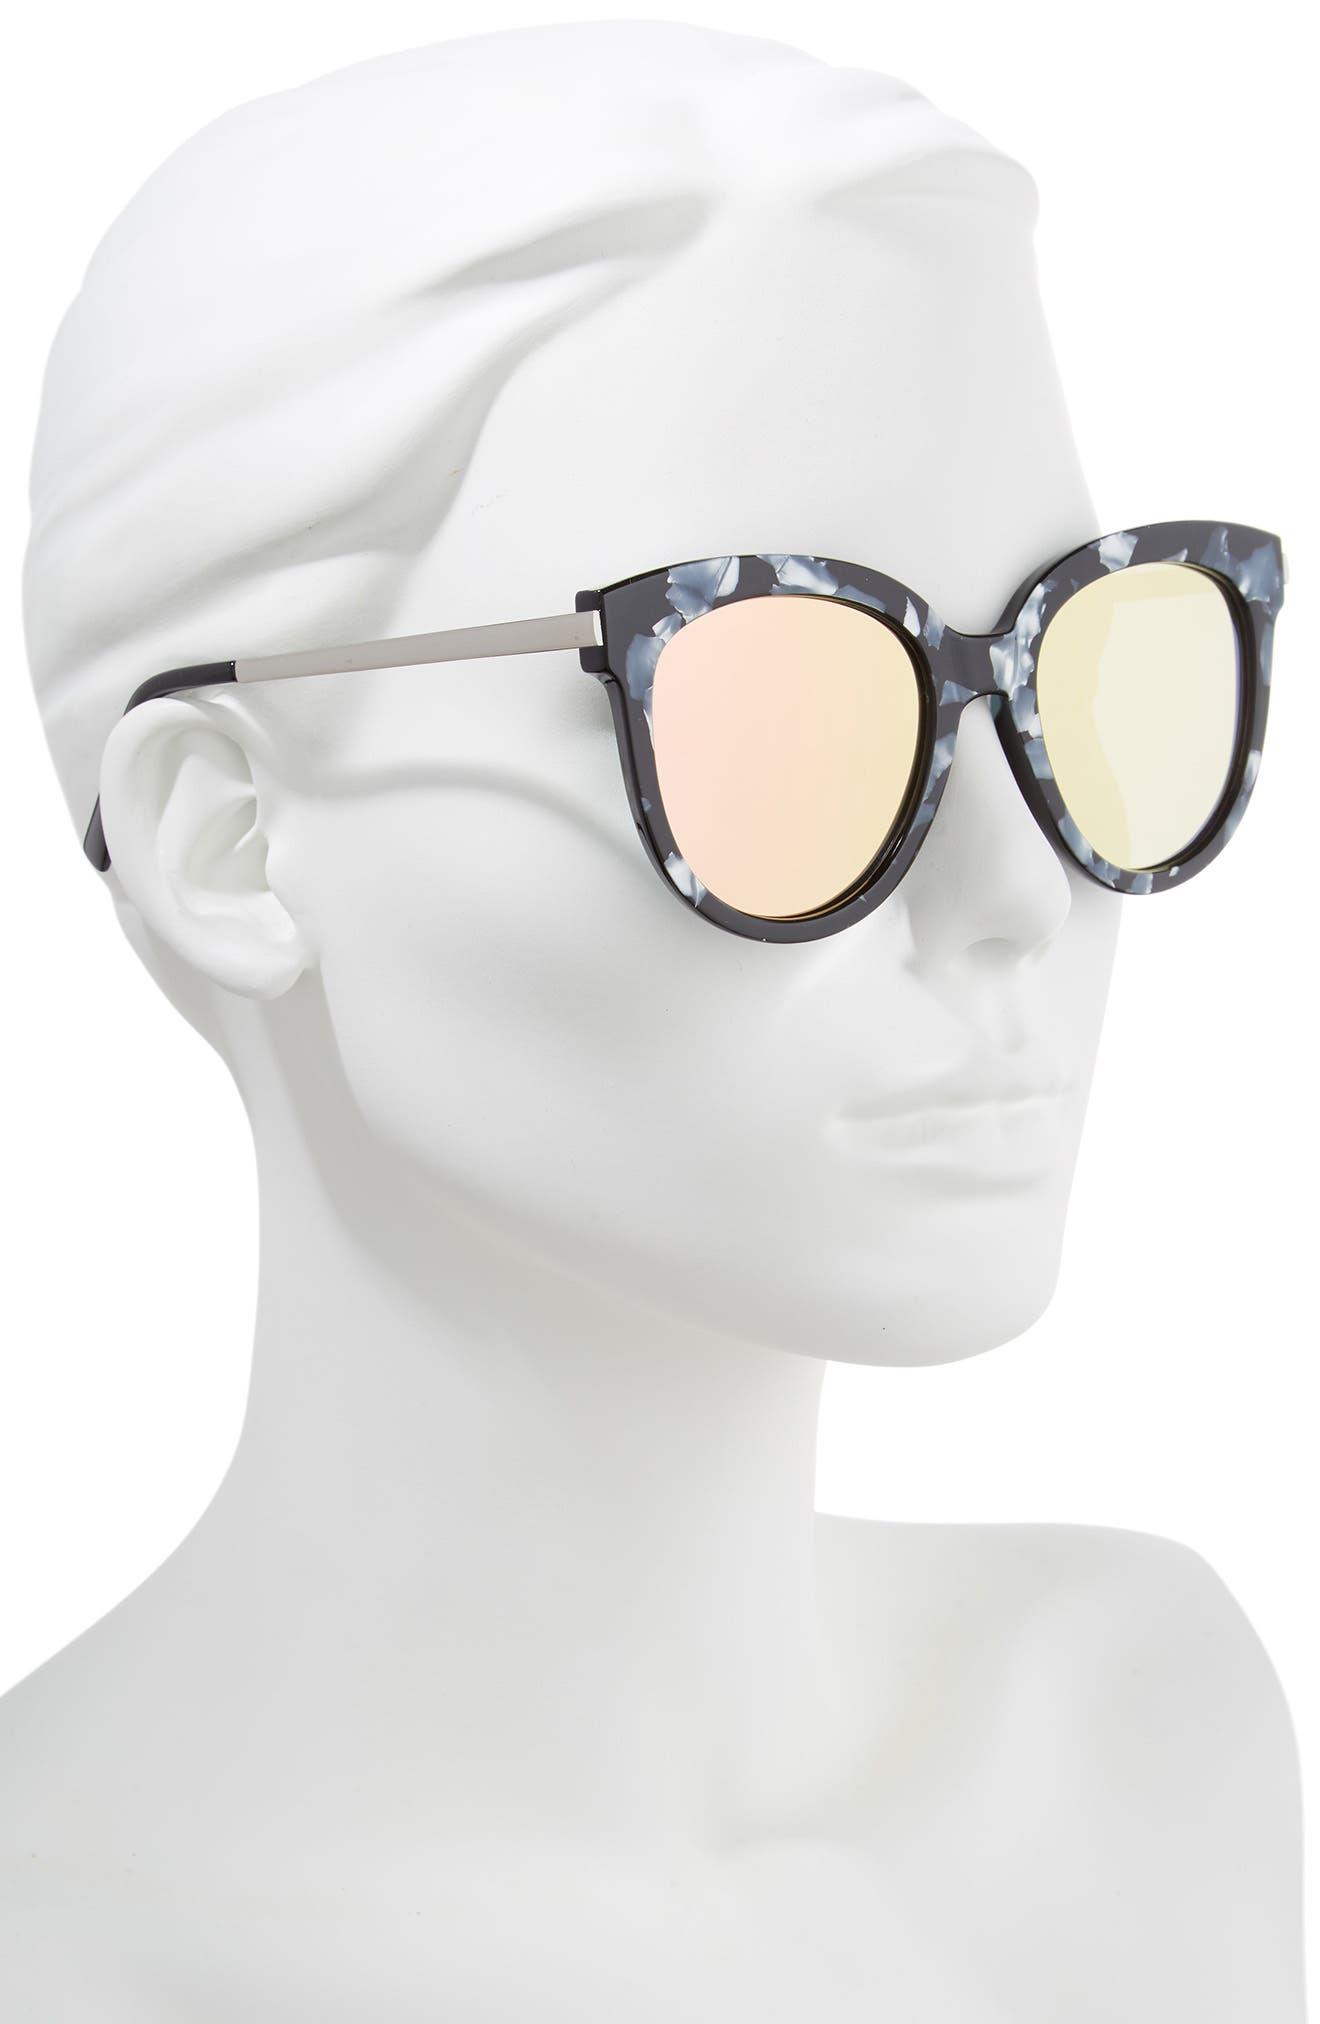 50mm Flat Cat Eye Sunglasses,                             Alternate thumbnail 2, color,                             Black Acide Pink